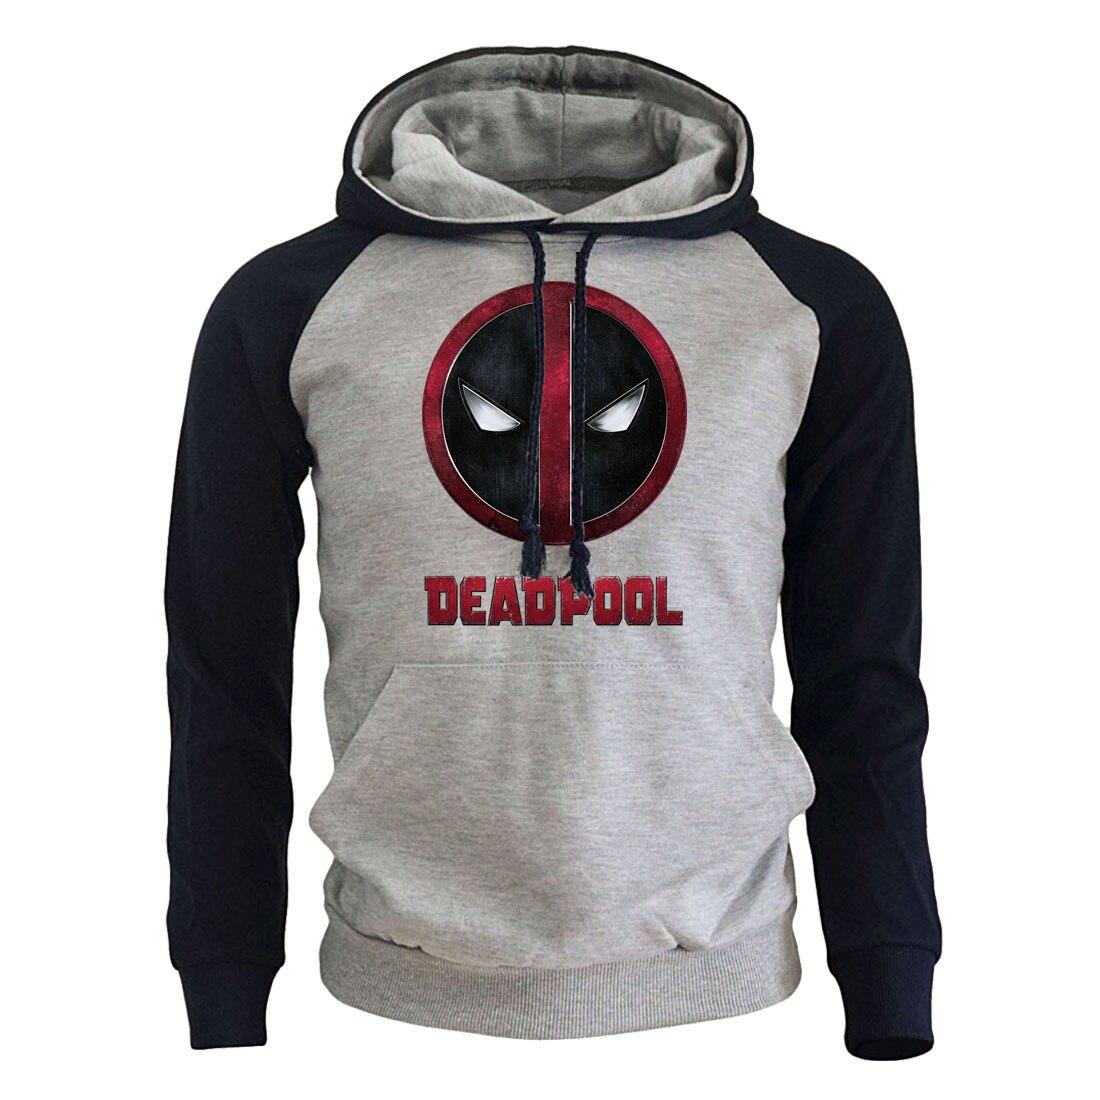 2019 New Arrival Raglan Hoodies DEADPOOL Fashion Funny Printed Casual Men's Sweatshirts Fleece Streetwear Man Hooded Tracksuit